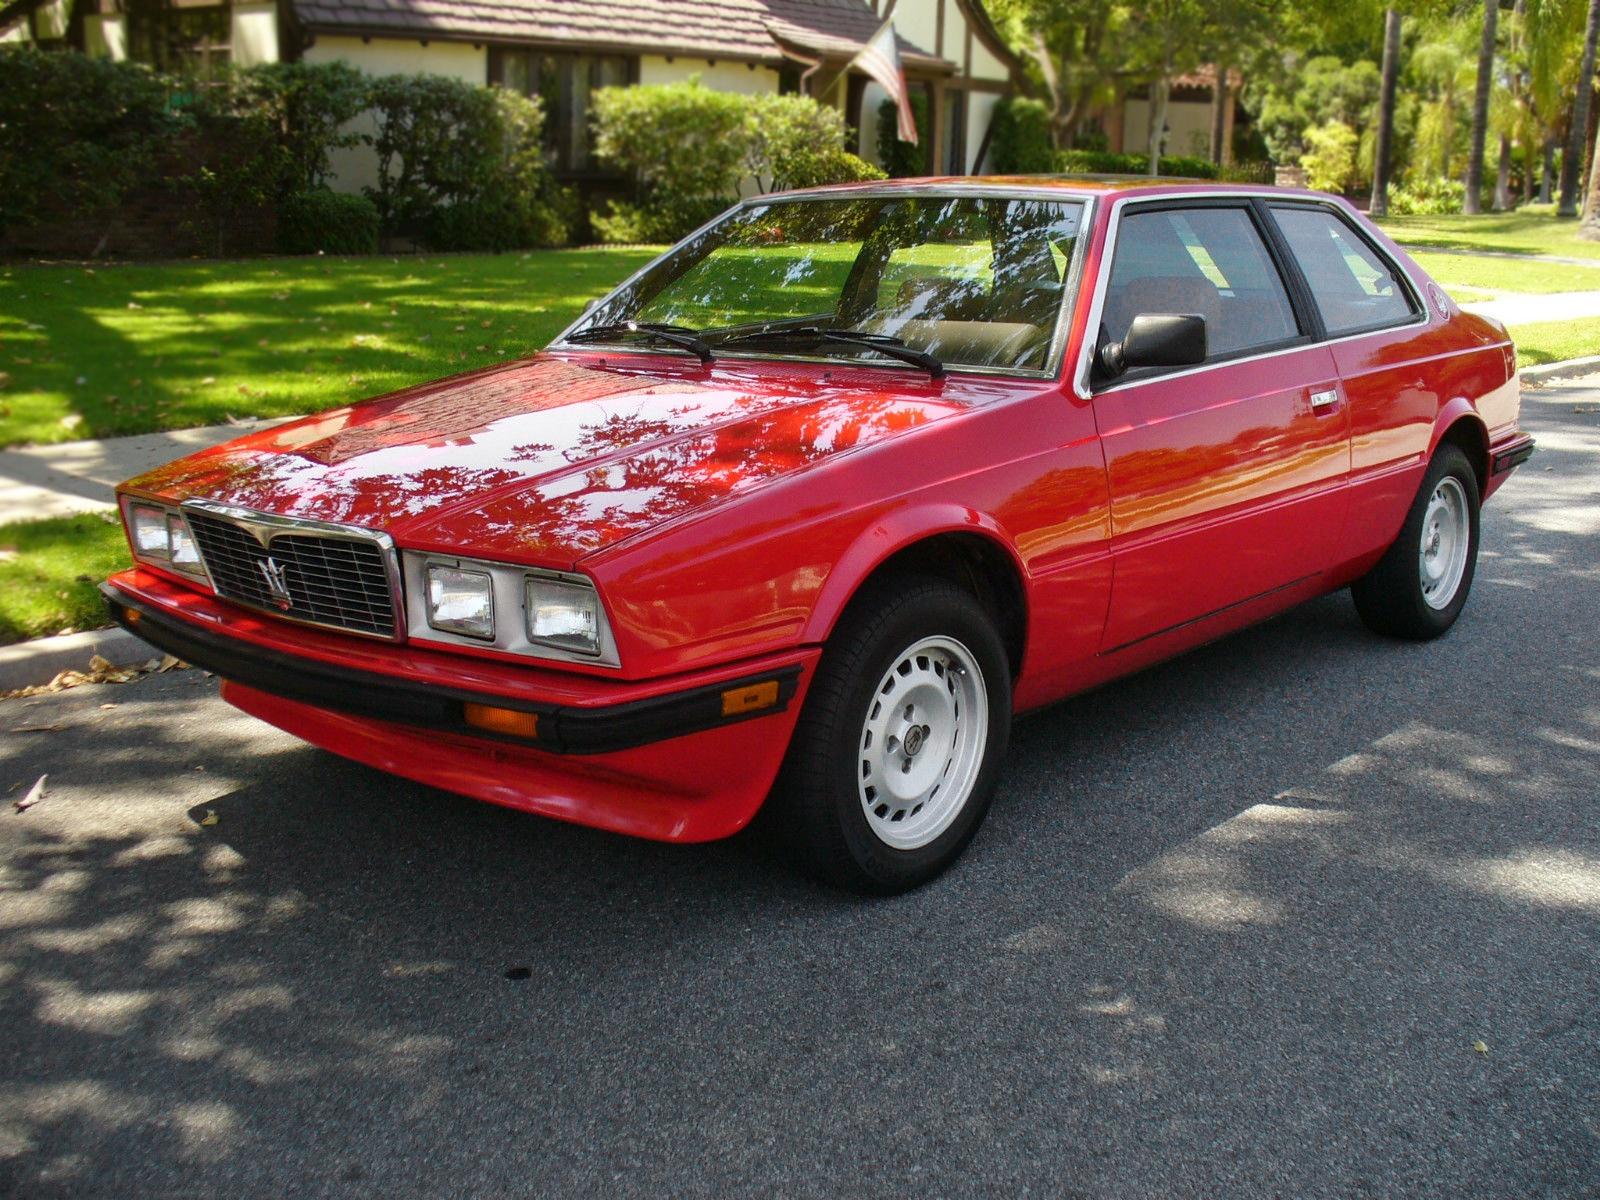 Barn Find Cars >> $3,895 Maserati: 1984 Maserati Biturbo E